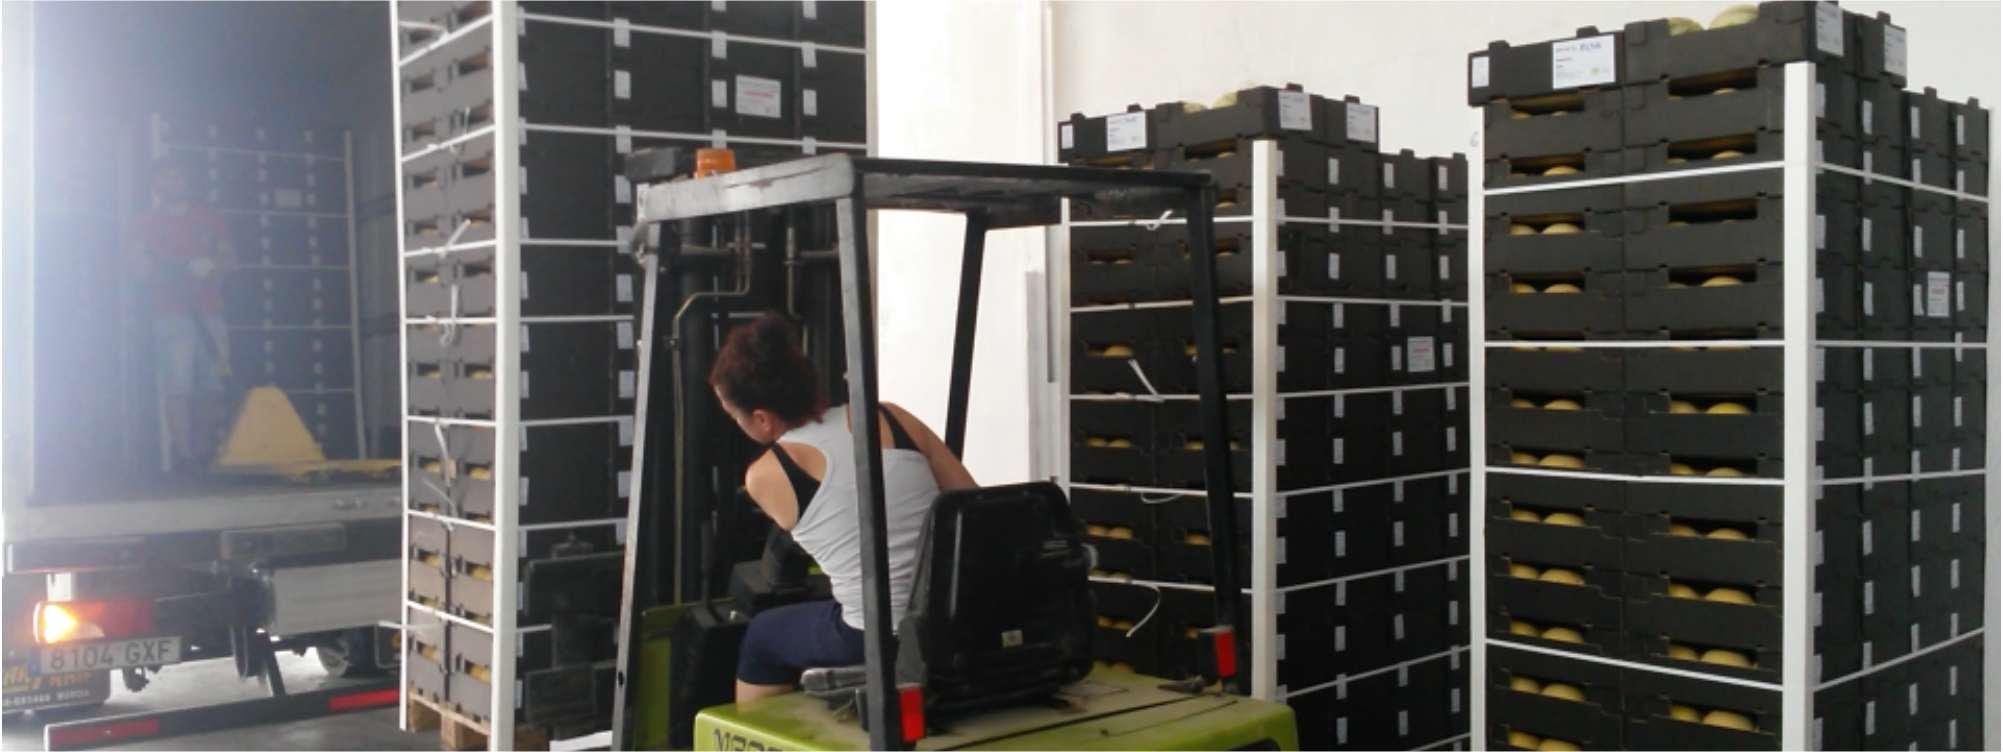 We offer international logistics and transport